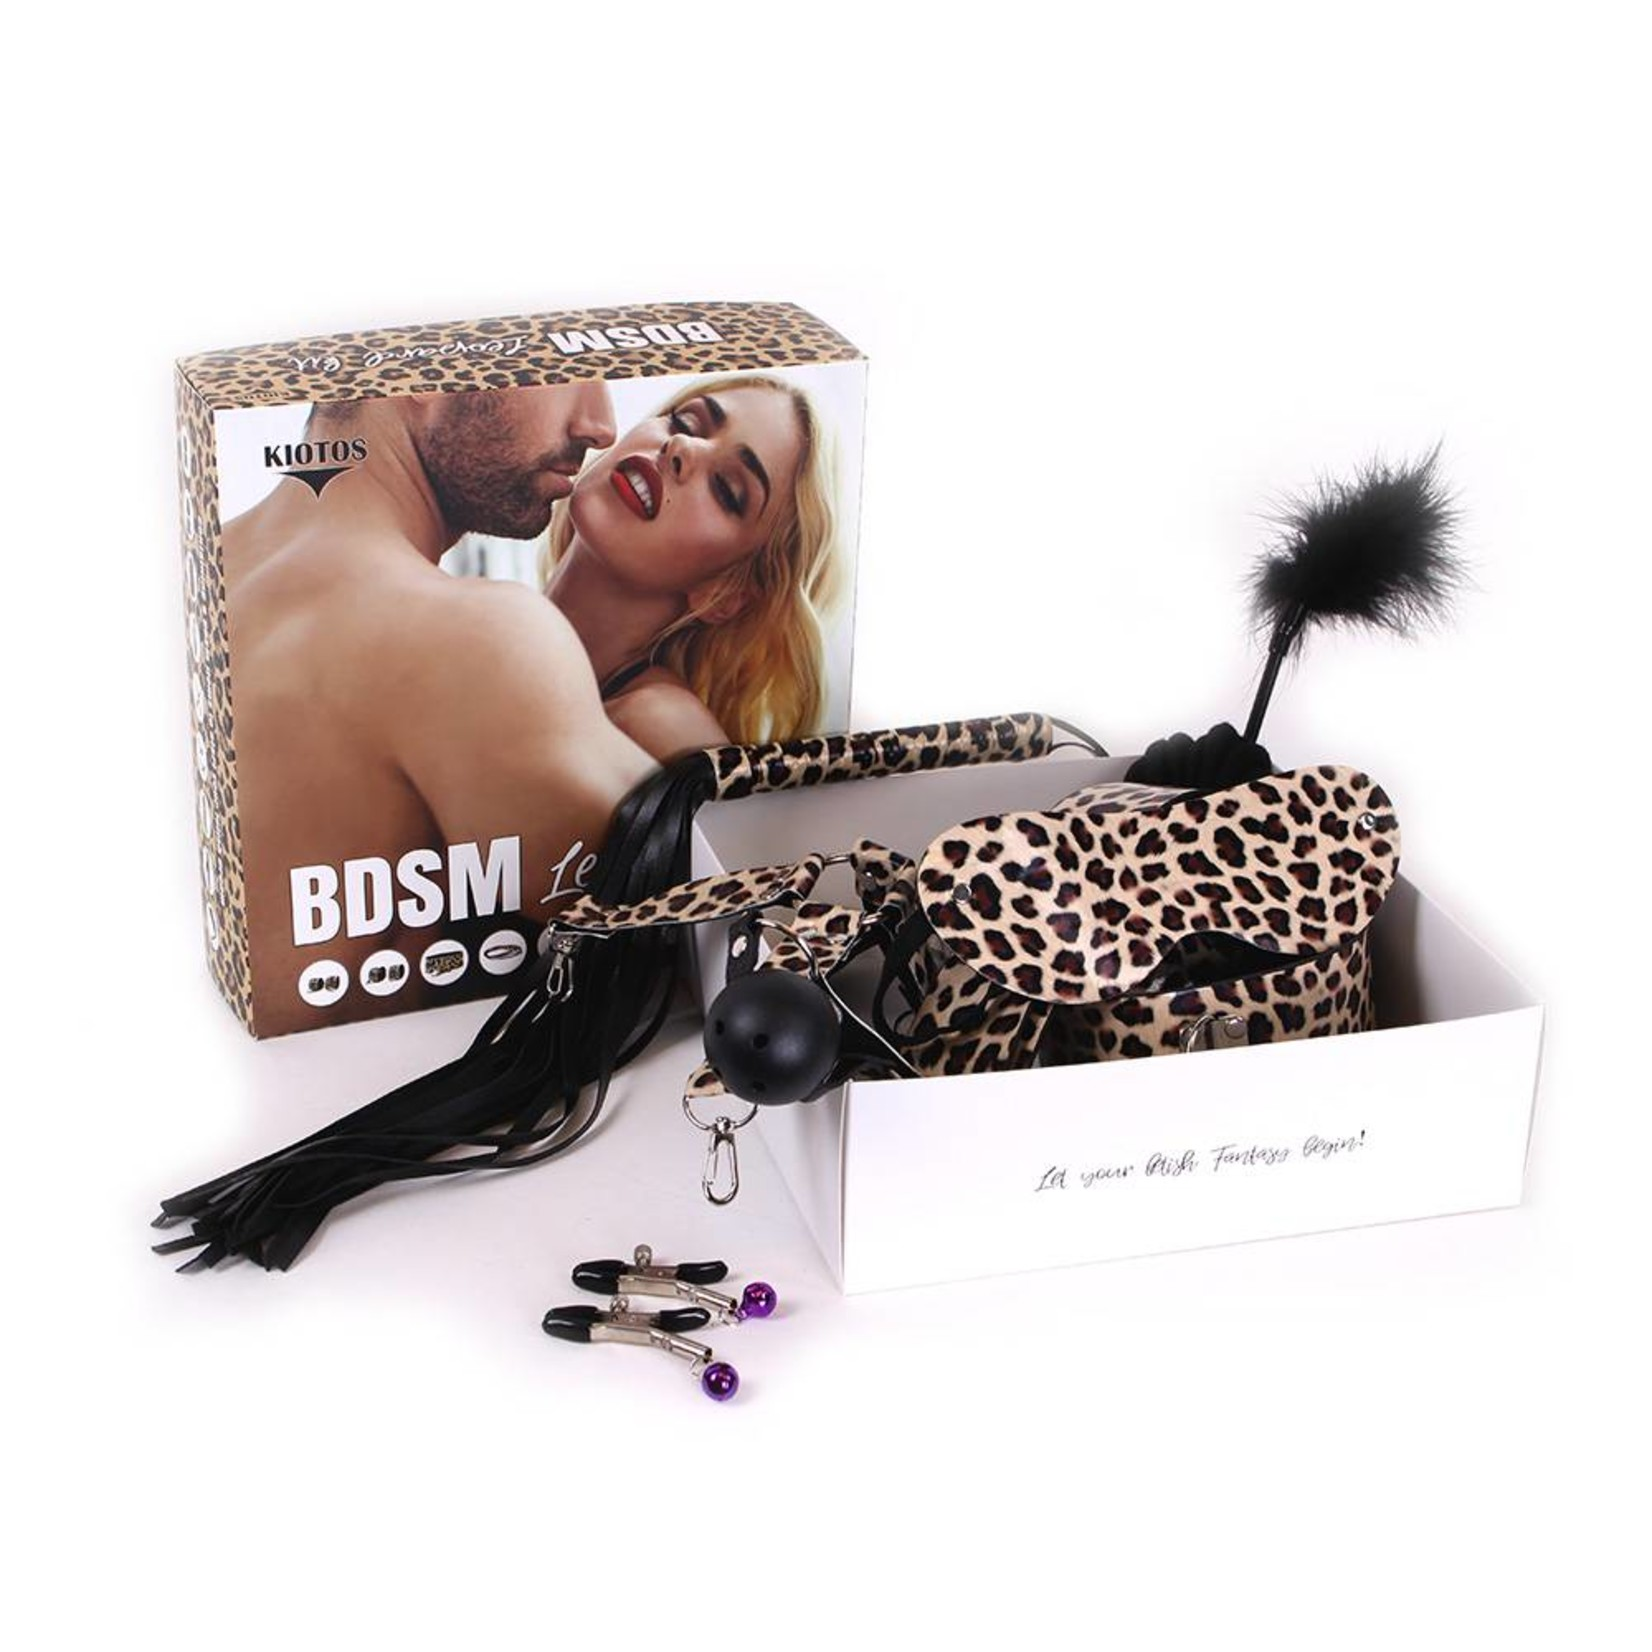 KIOTOS Bondage Set | BDSM Leopard Kit